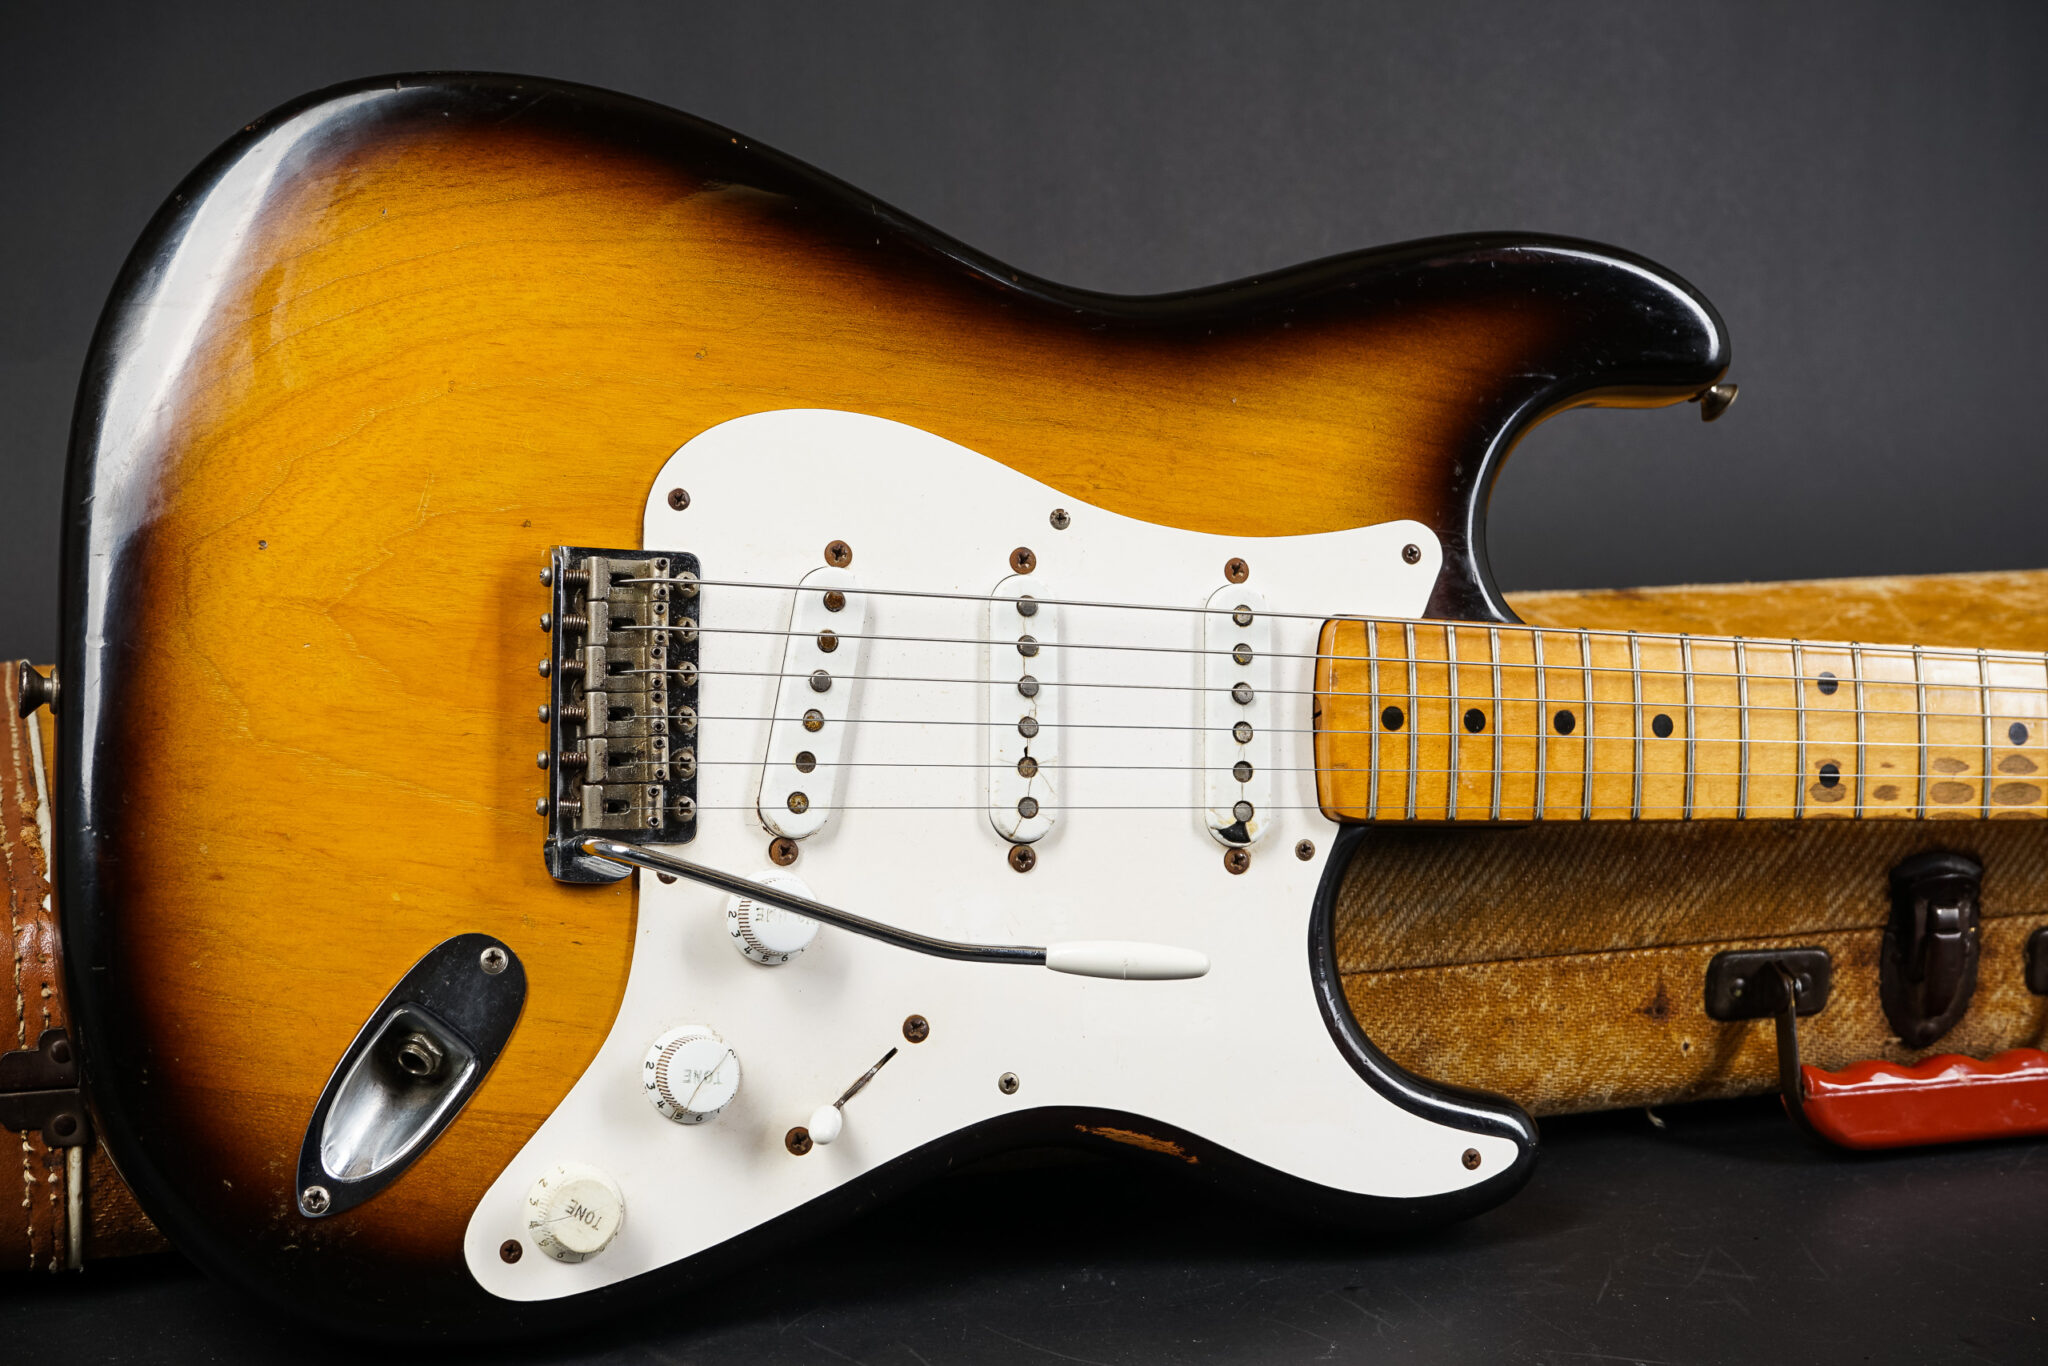 https://guitarpoint.de/app/uploads/products/1954-fender-stratocaster-0967/1954-Fender-Stratocaster-0967-9-2048x1366.jpg